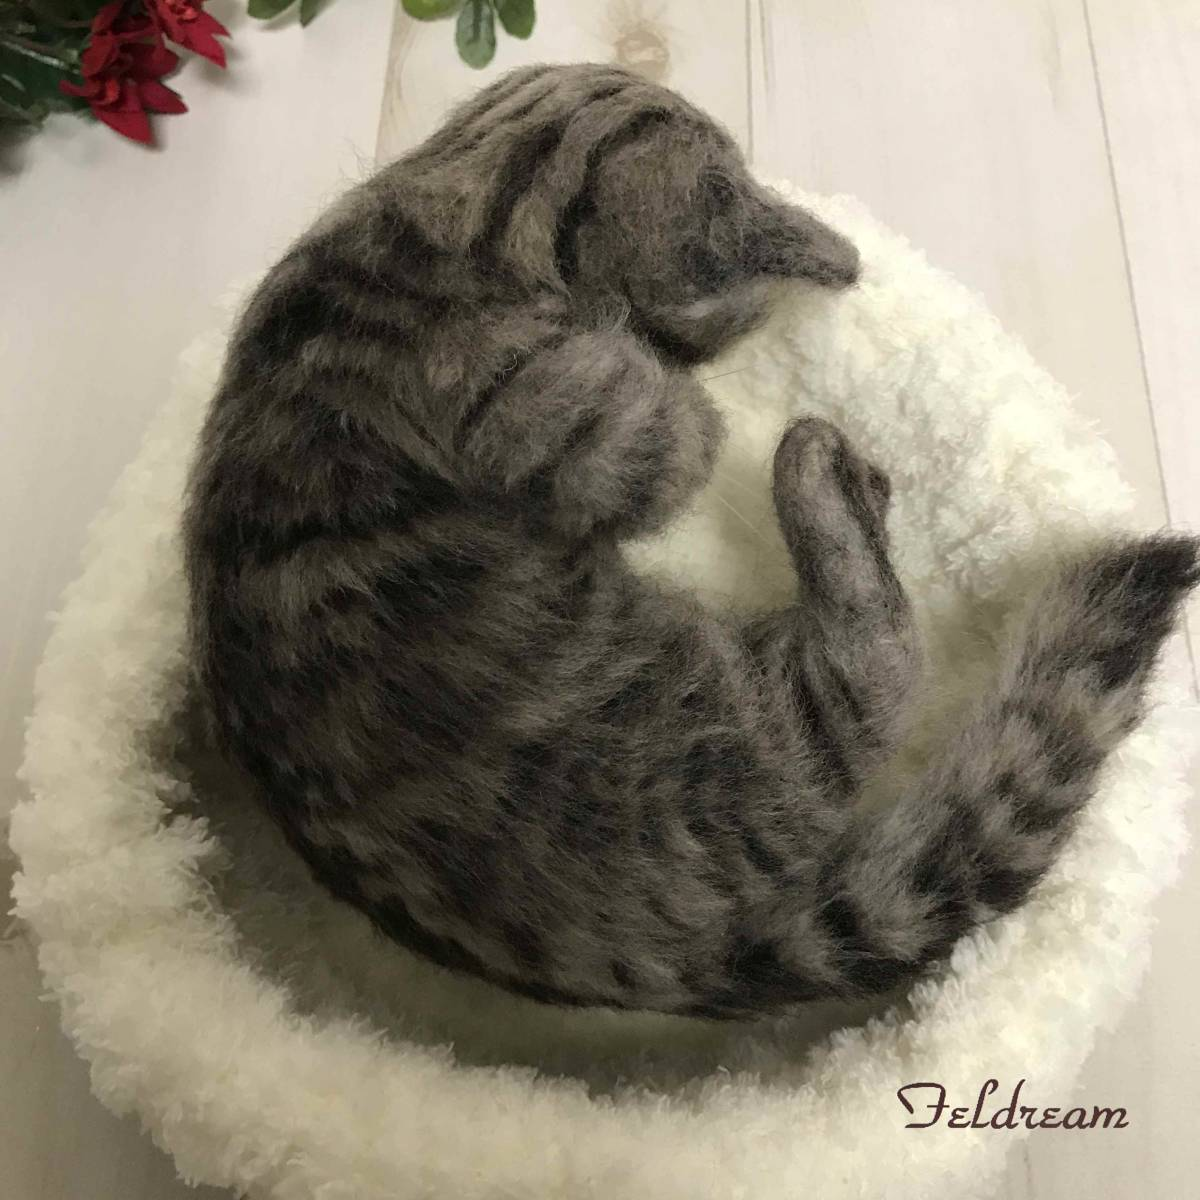 Feldream◆羊毛フェルト猫 ごろにゃん♪ キジトラ子猫 《実物大》 ハンドメイド_画像10